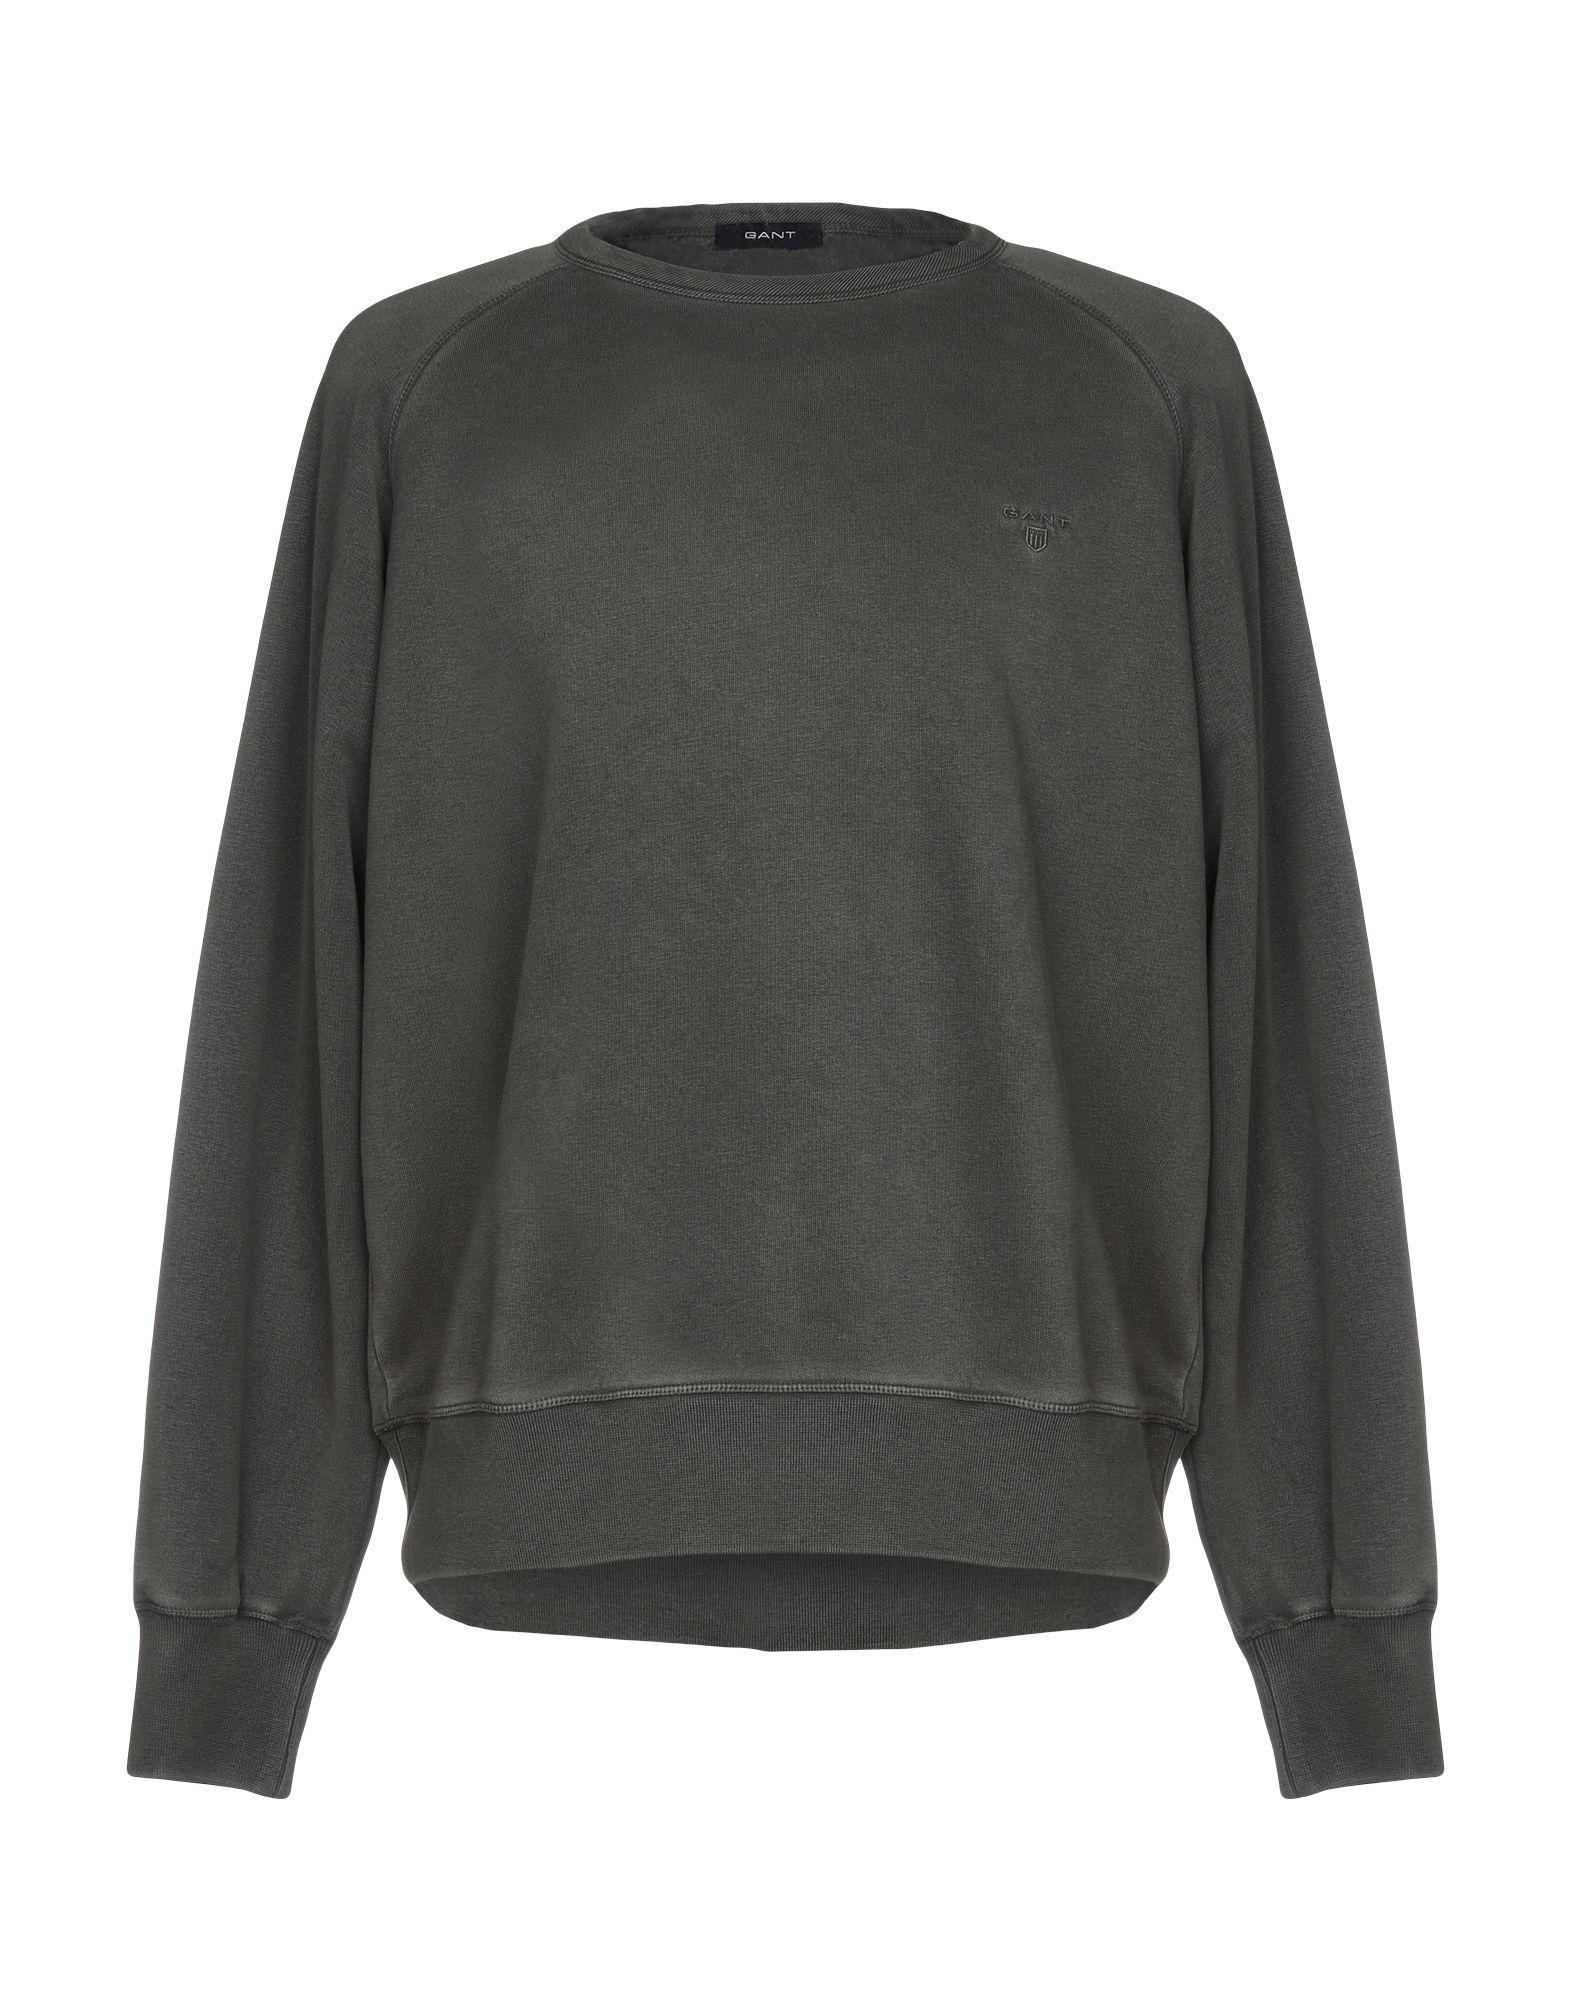 f1777530d7b Lyst - Gant Sweatshirt in Gray for Men